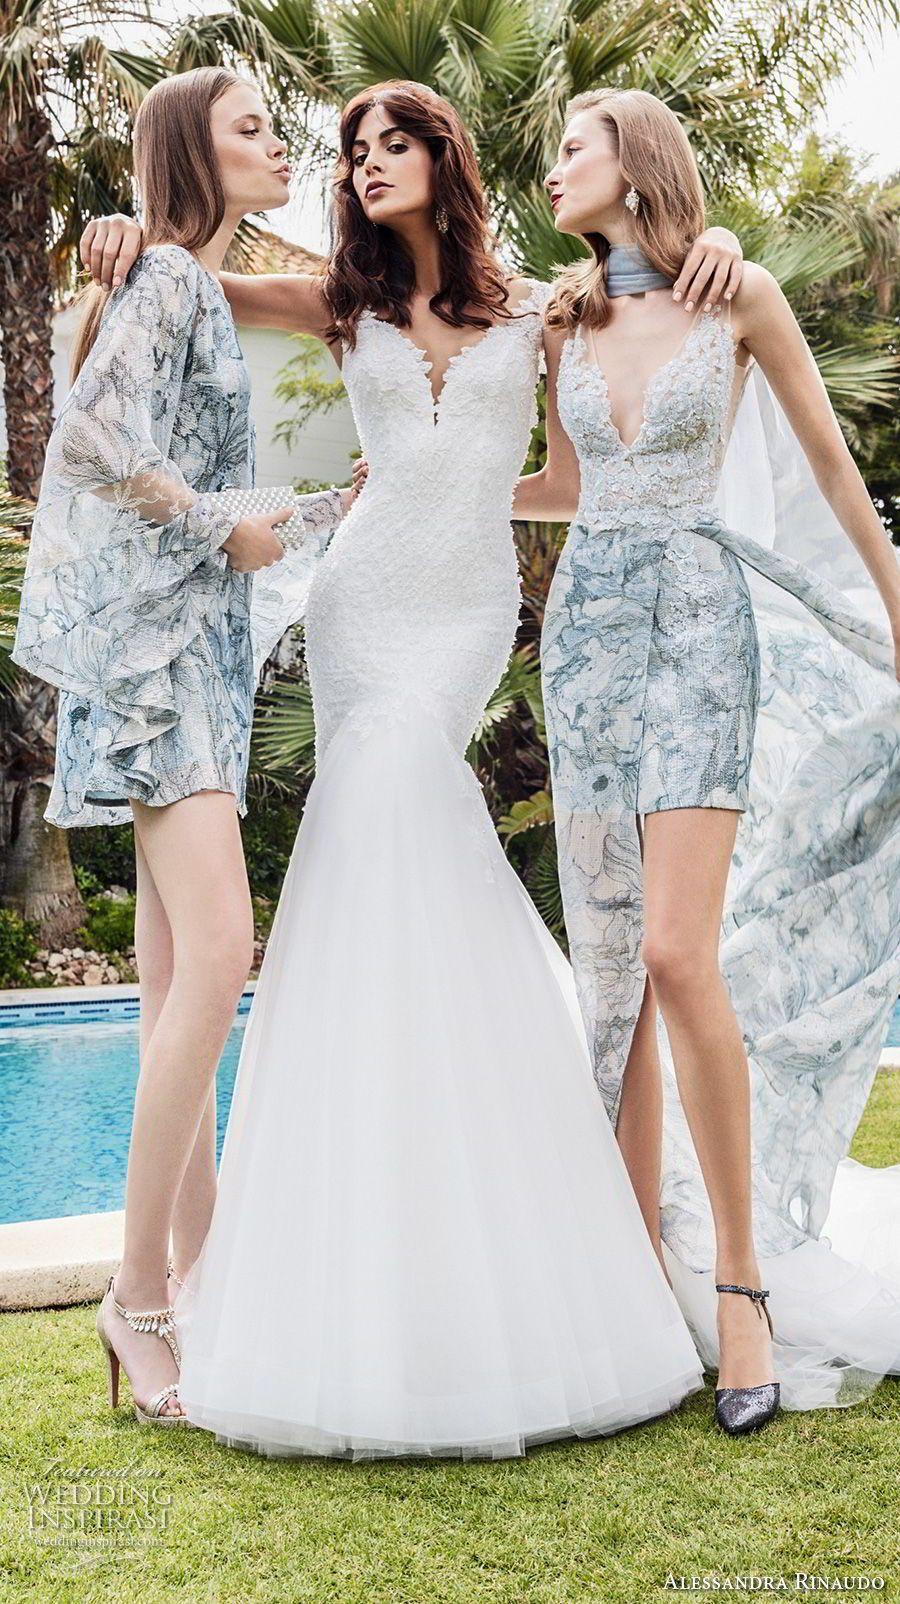 Alessandra rinaudo wedding dresses mermaid wedding dresses